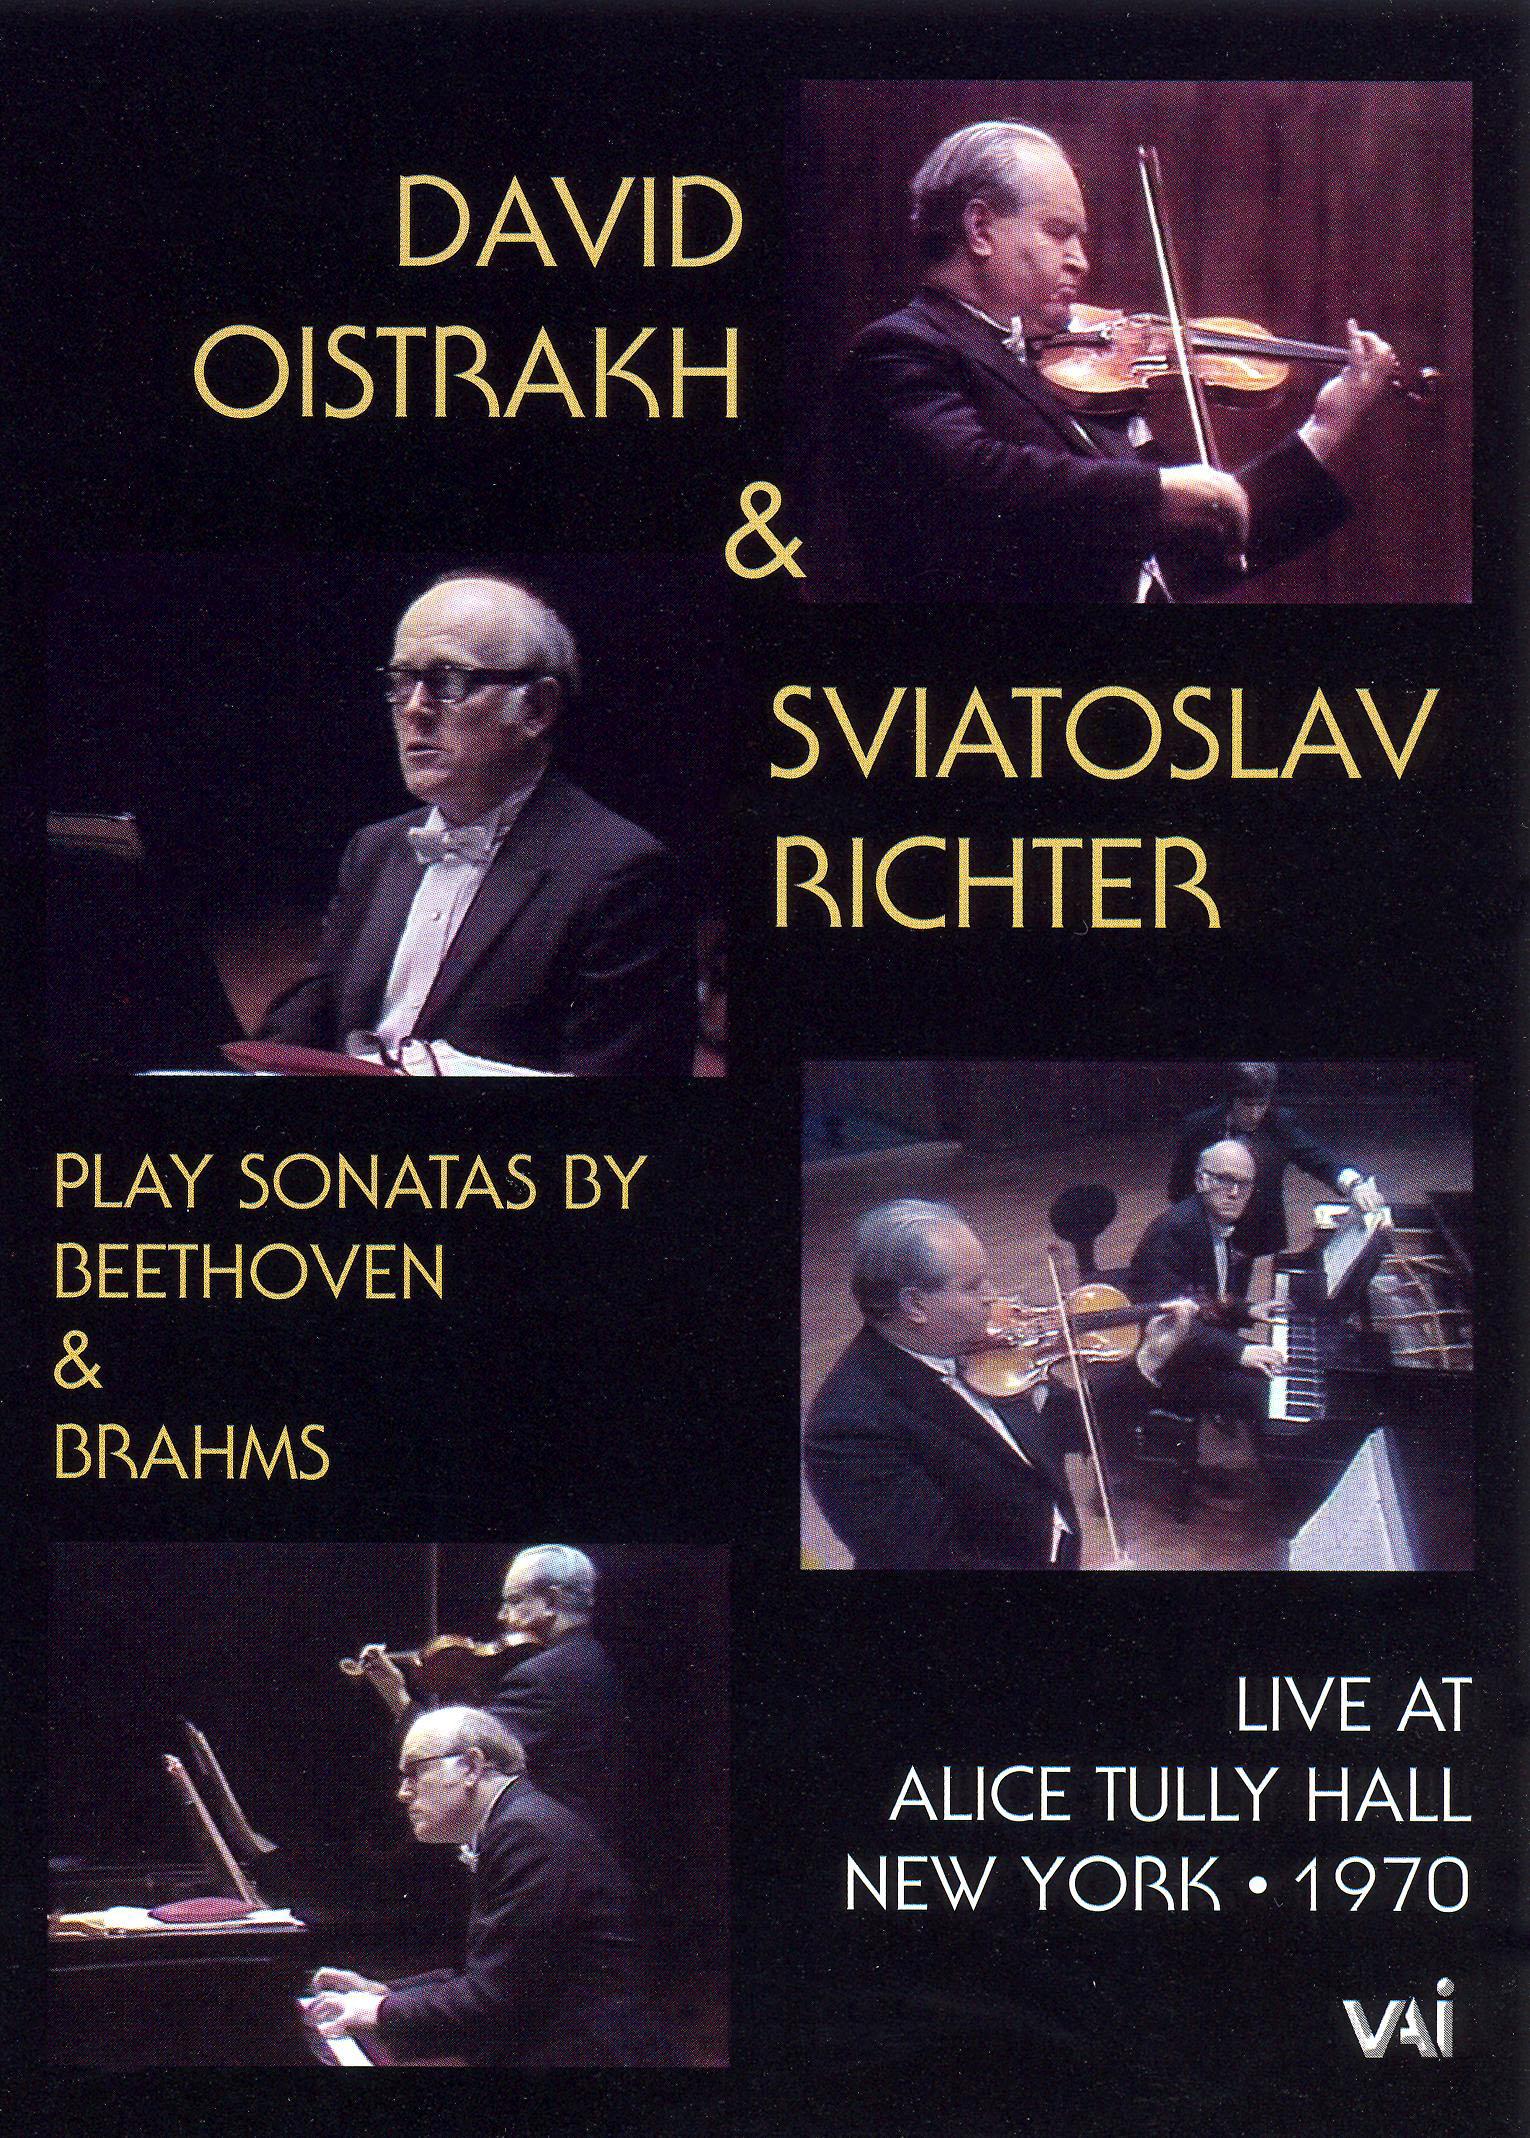 David Oistrakh & Sviatoslav Richter Play Sonatas By Beethoven & Brahms: Live at Alice Tully Hall